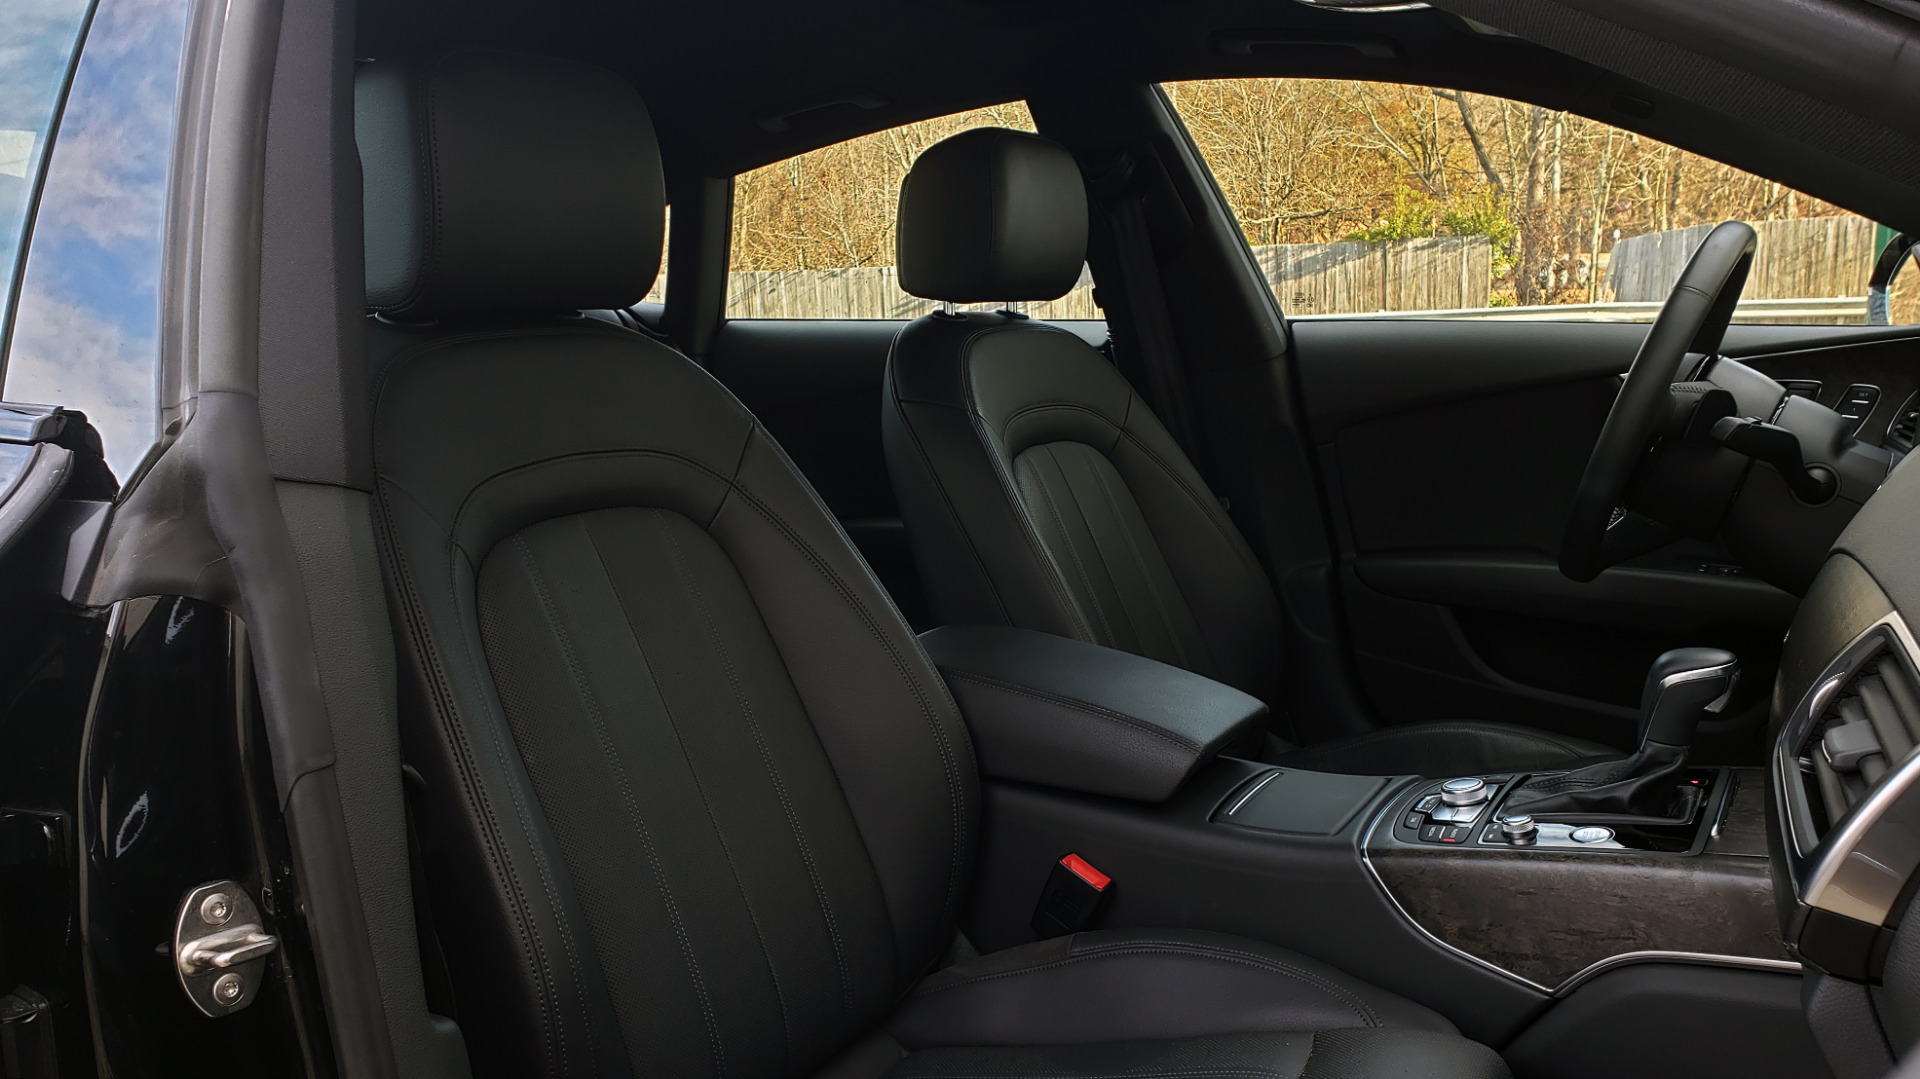 Used 2017 Audi A7 PRESTIGE / DRVR ASST / S-LINE SPORT / NAV / REARVIEW for sale Sold at Formula Imports in Charlotte NC 28227 67